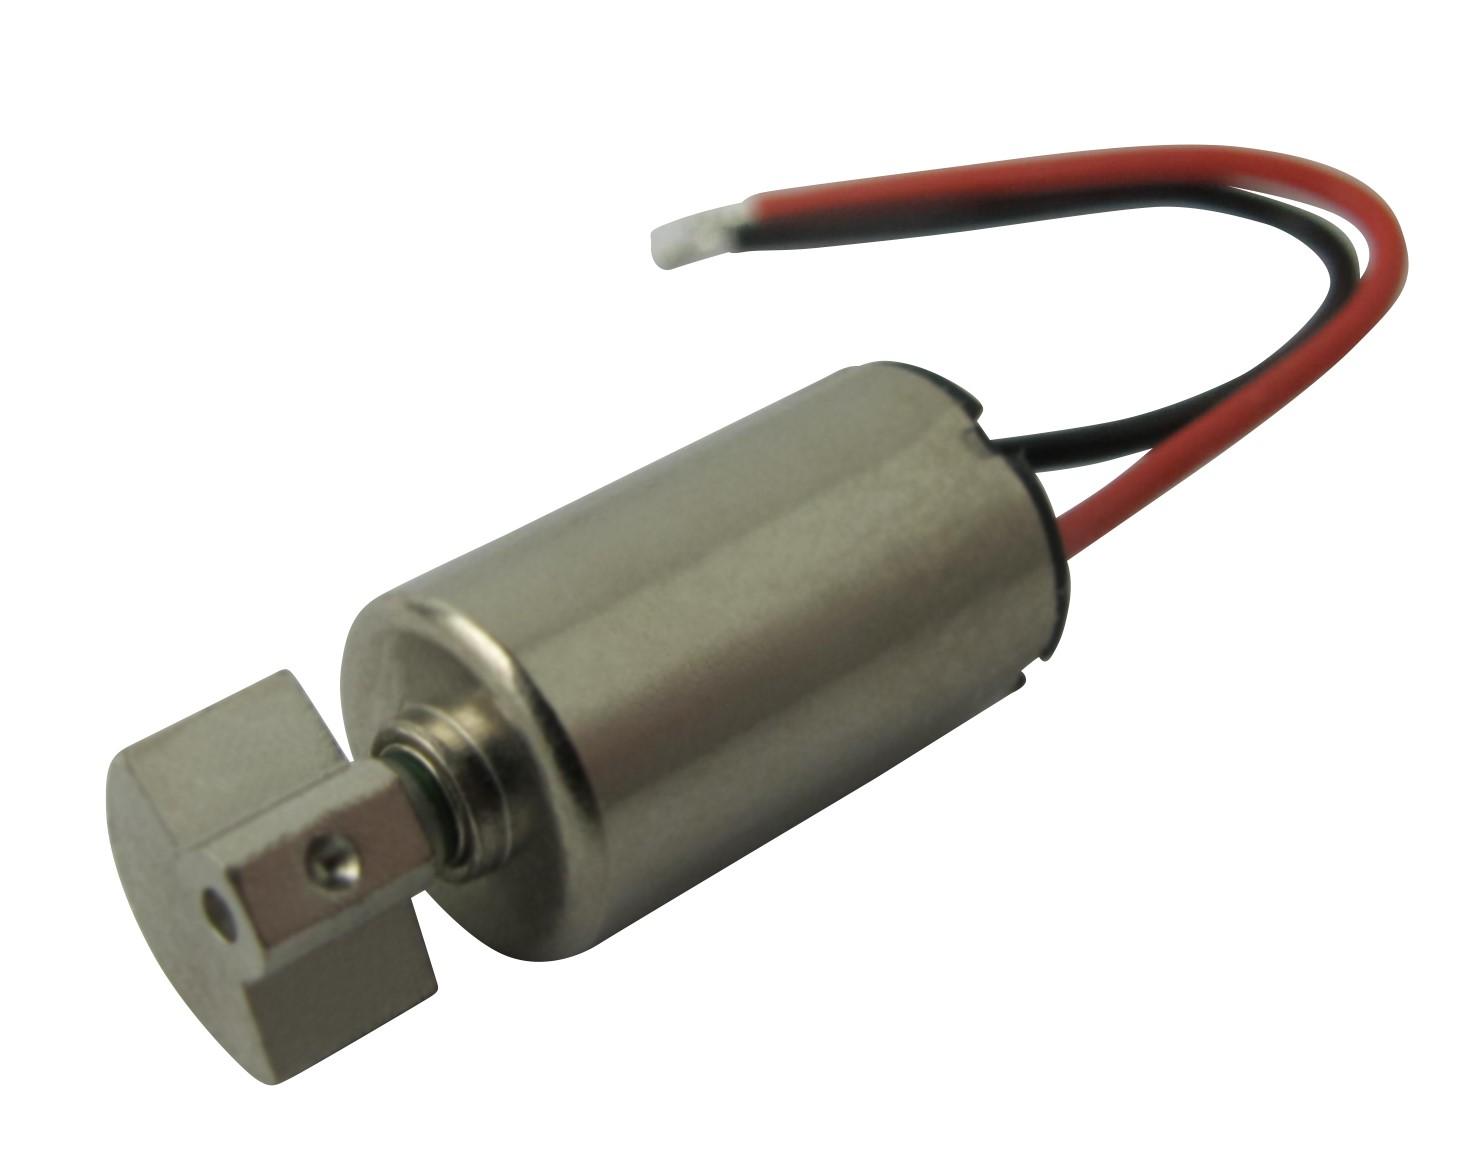 Z6SL2B0060001 Cylindrical Vibrator Motor